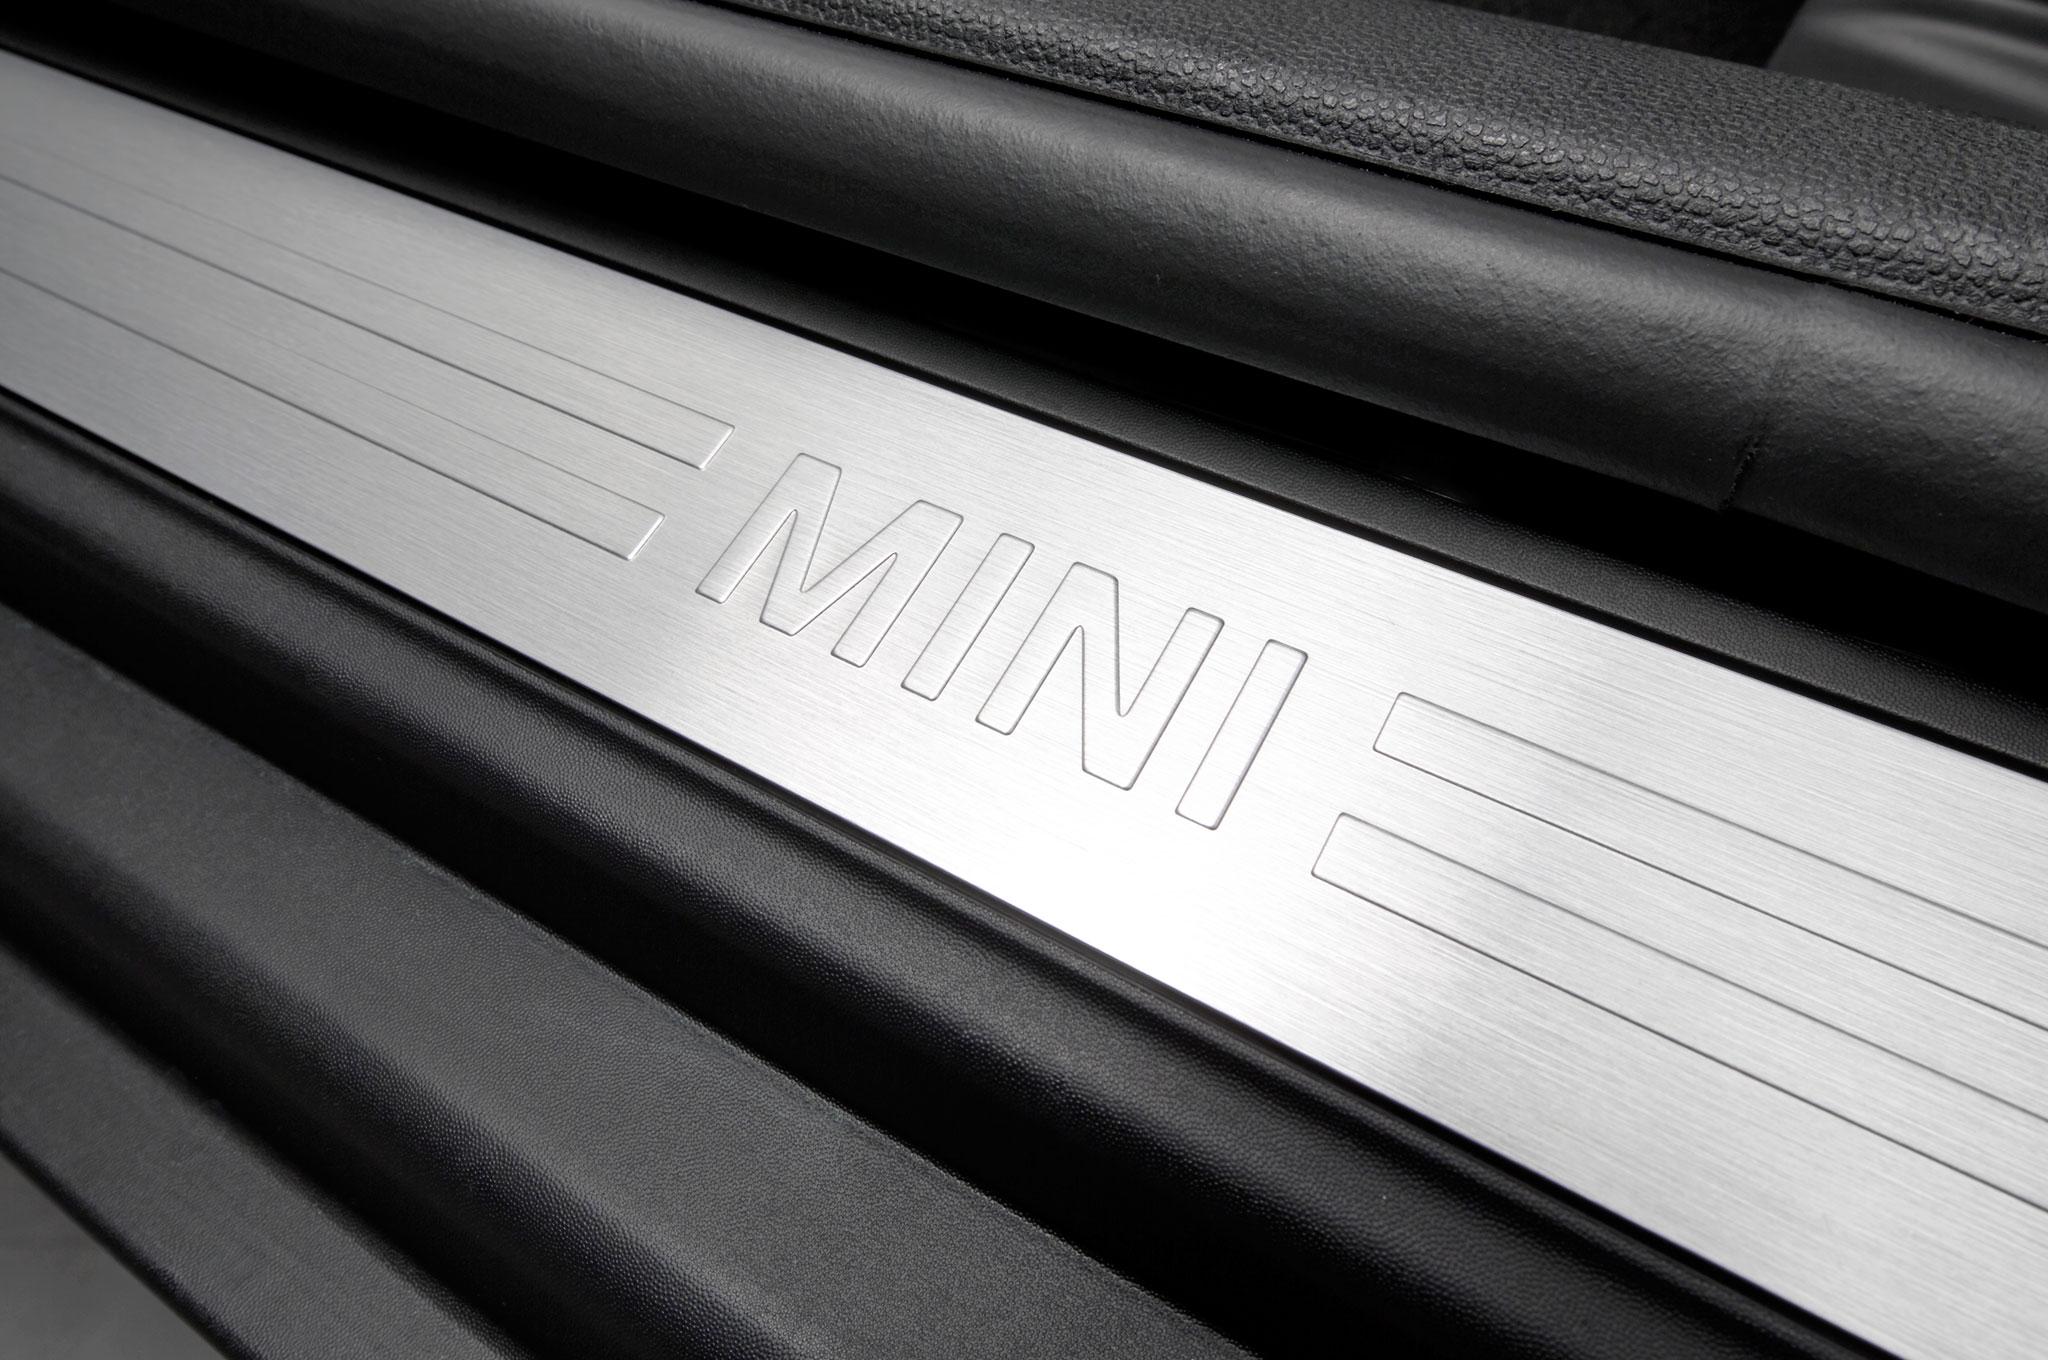 2016 Mini Clubman Interior Door Sill Plate Motor Trend En Español